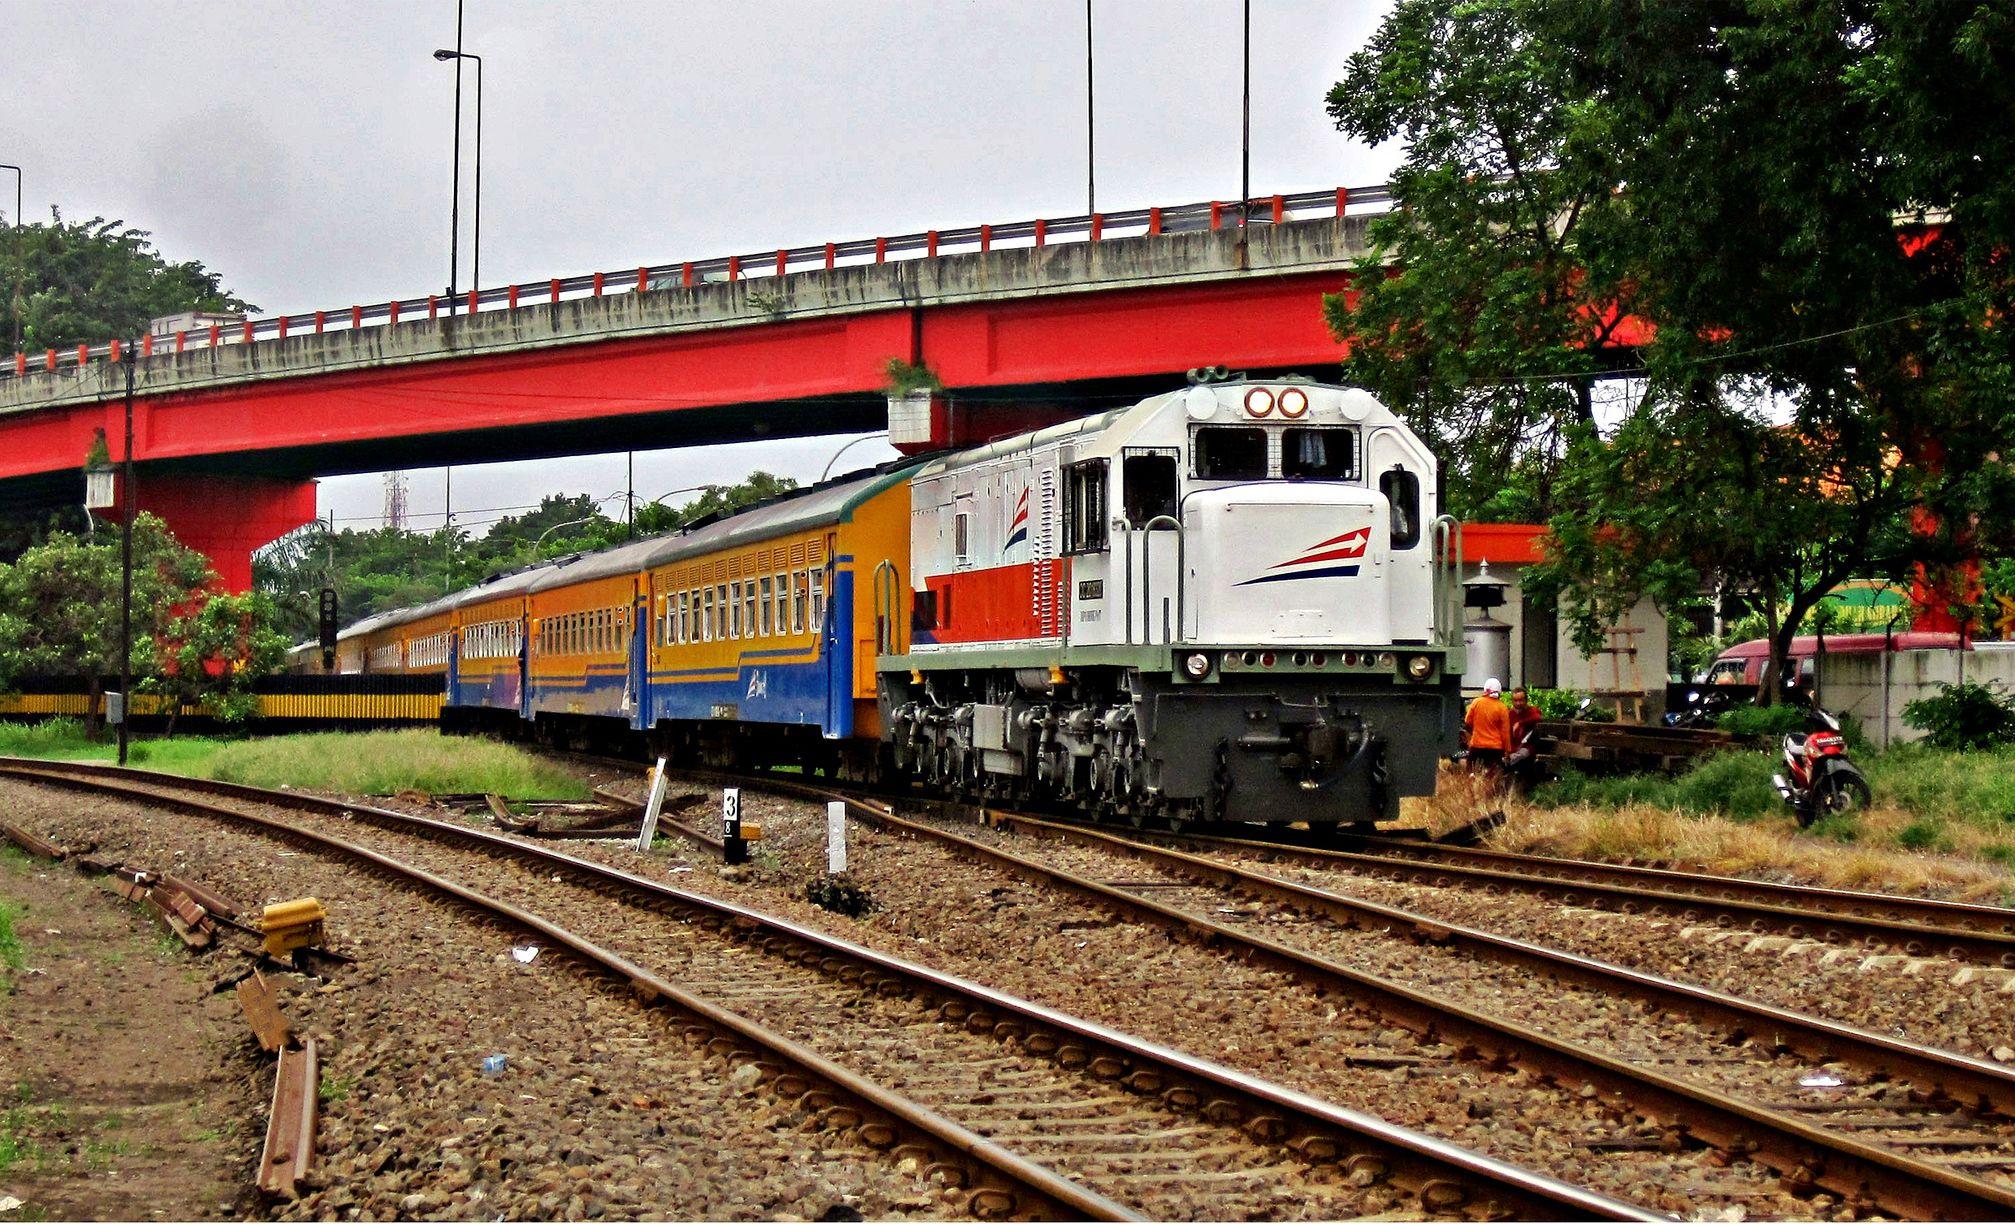 Kereta Api Indonesia Argo Bromo Anggrek Pinterest Locomotive Tugu Mayangkara